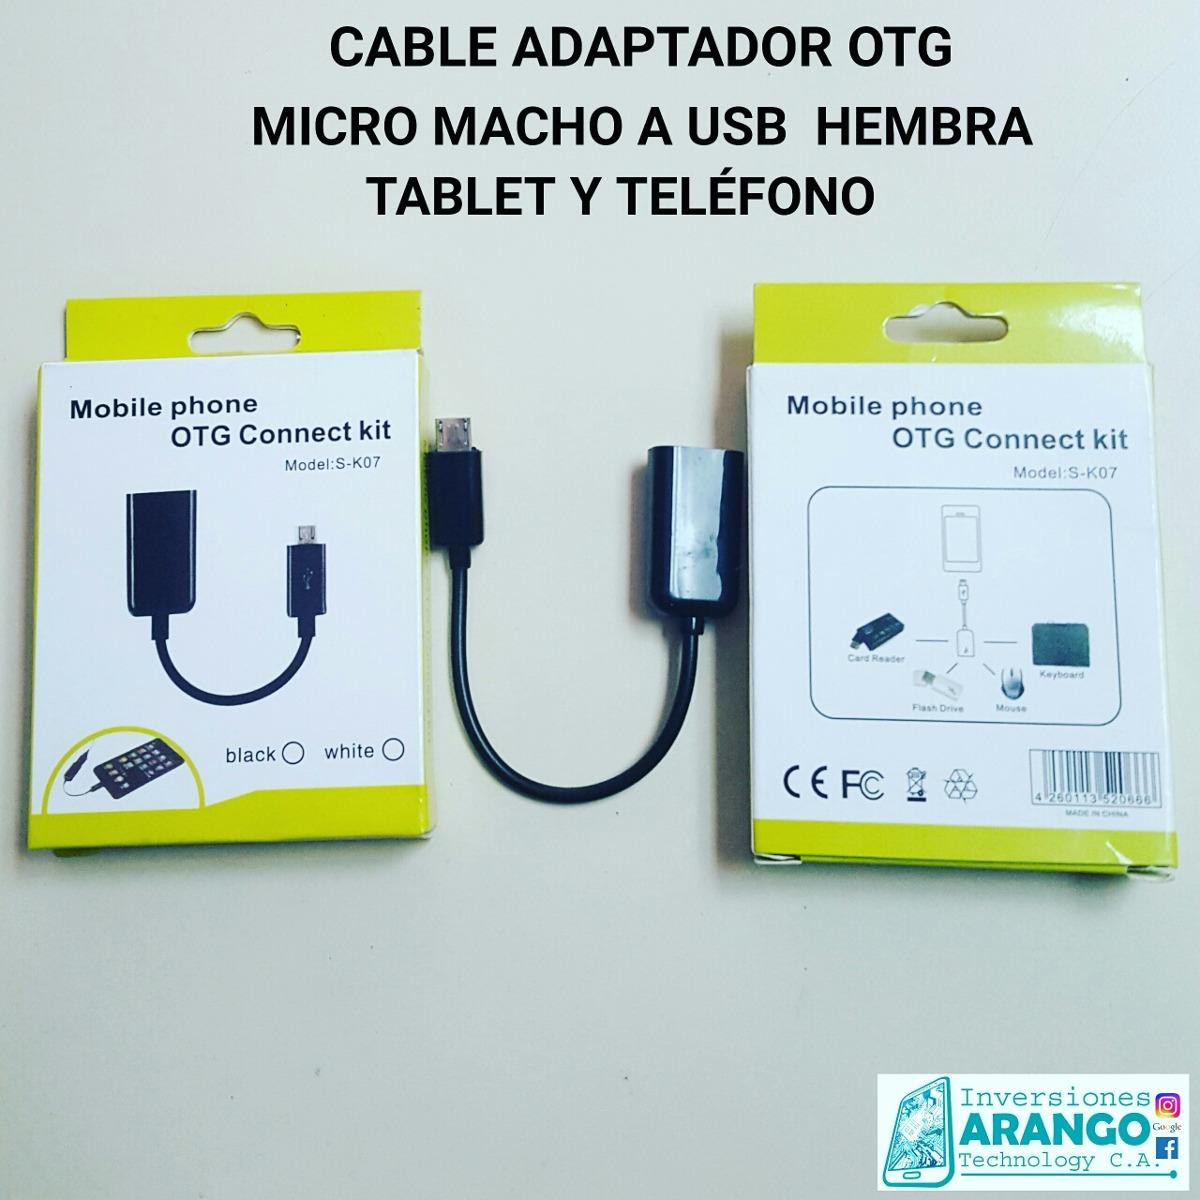 Adaptador Otg Macho Micro A Hembra Usb Tablet Y Telfono Bs 1000 Kabel Connect Kit Model S K07 Cargando Zoom